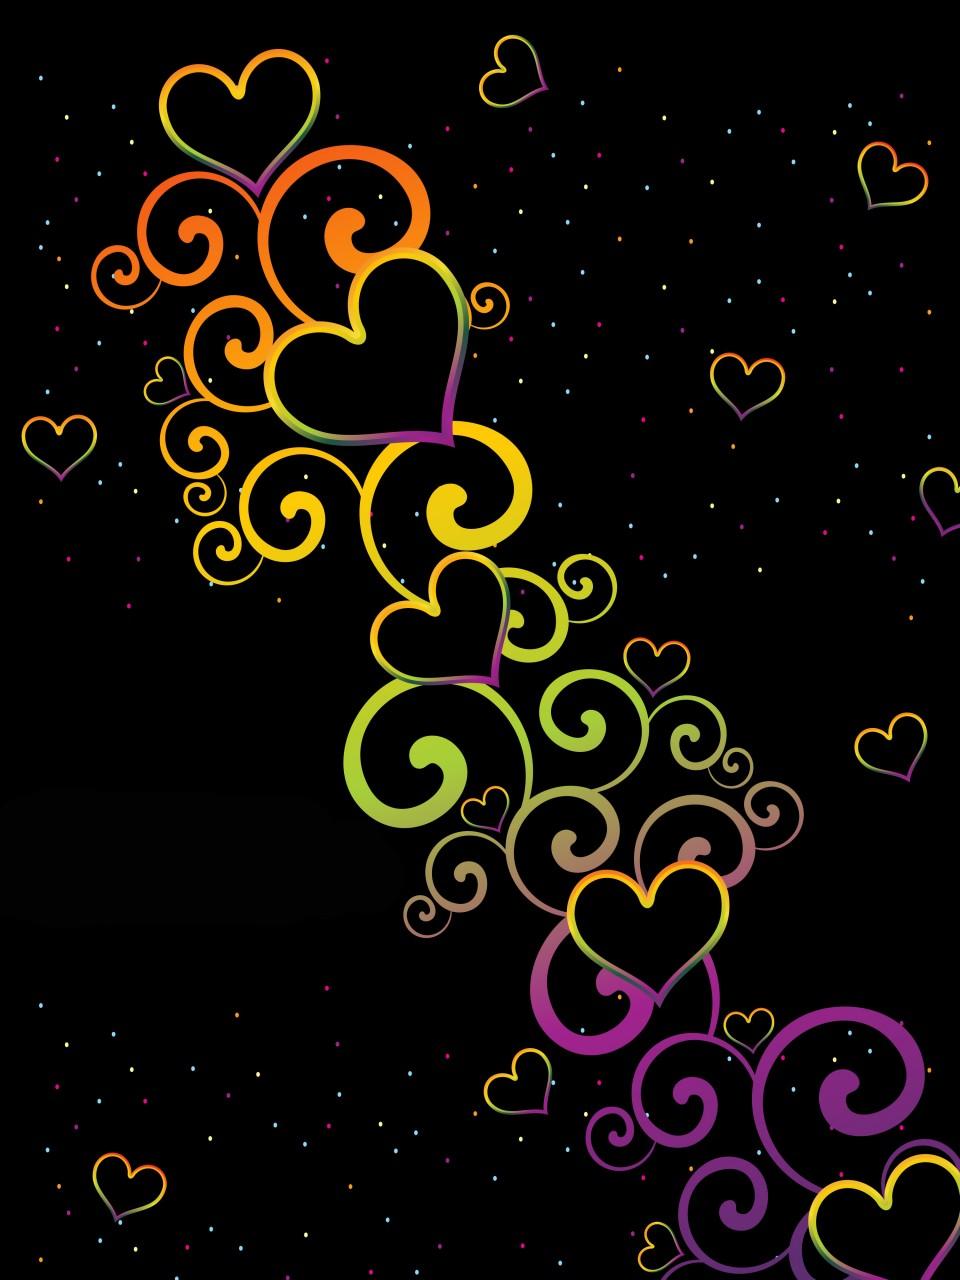 71 colorful hearts wallpaper on wallpapersafari - Heart to heart wallpaper ...